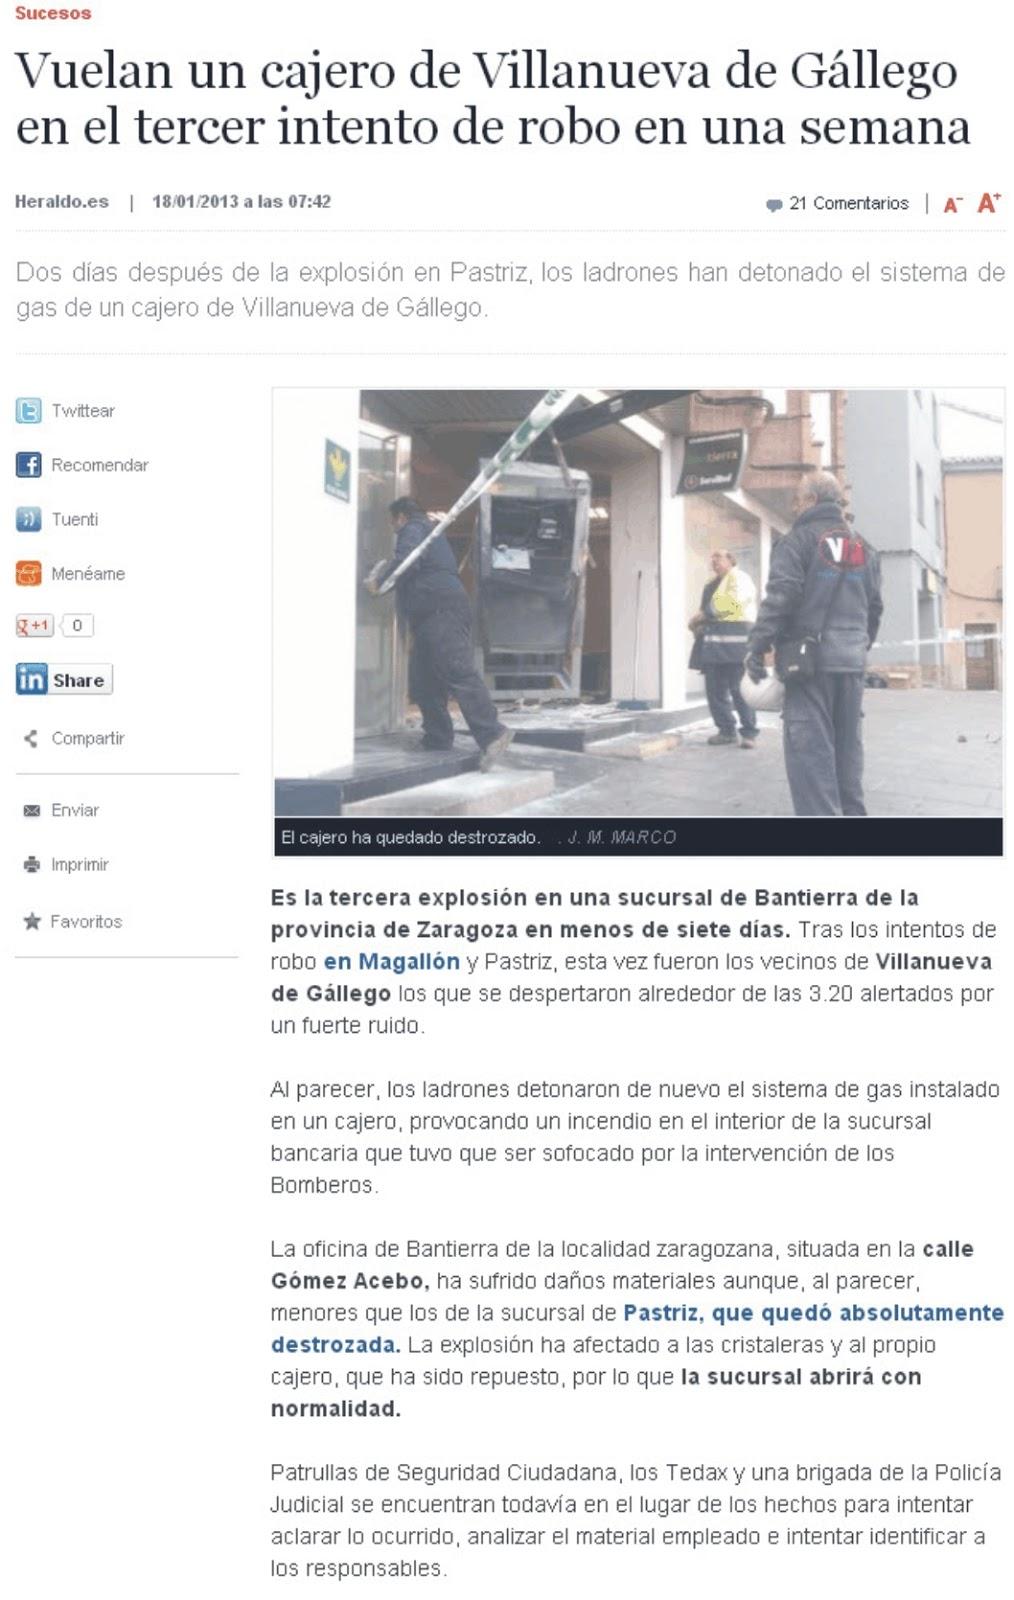 El blog de san mateo de g llego robo en bantierra de for Bankia oficina internet entrar directo